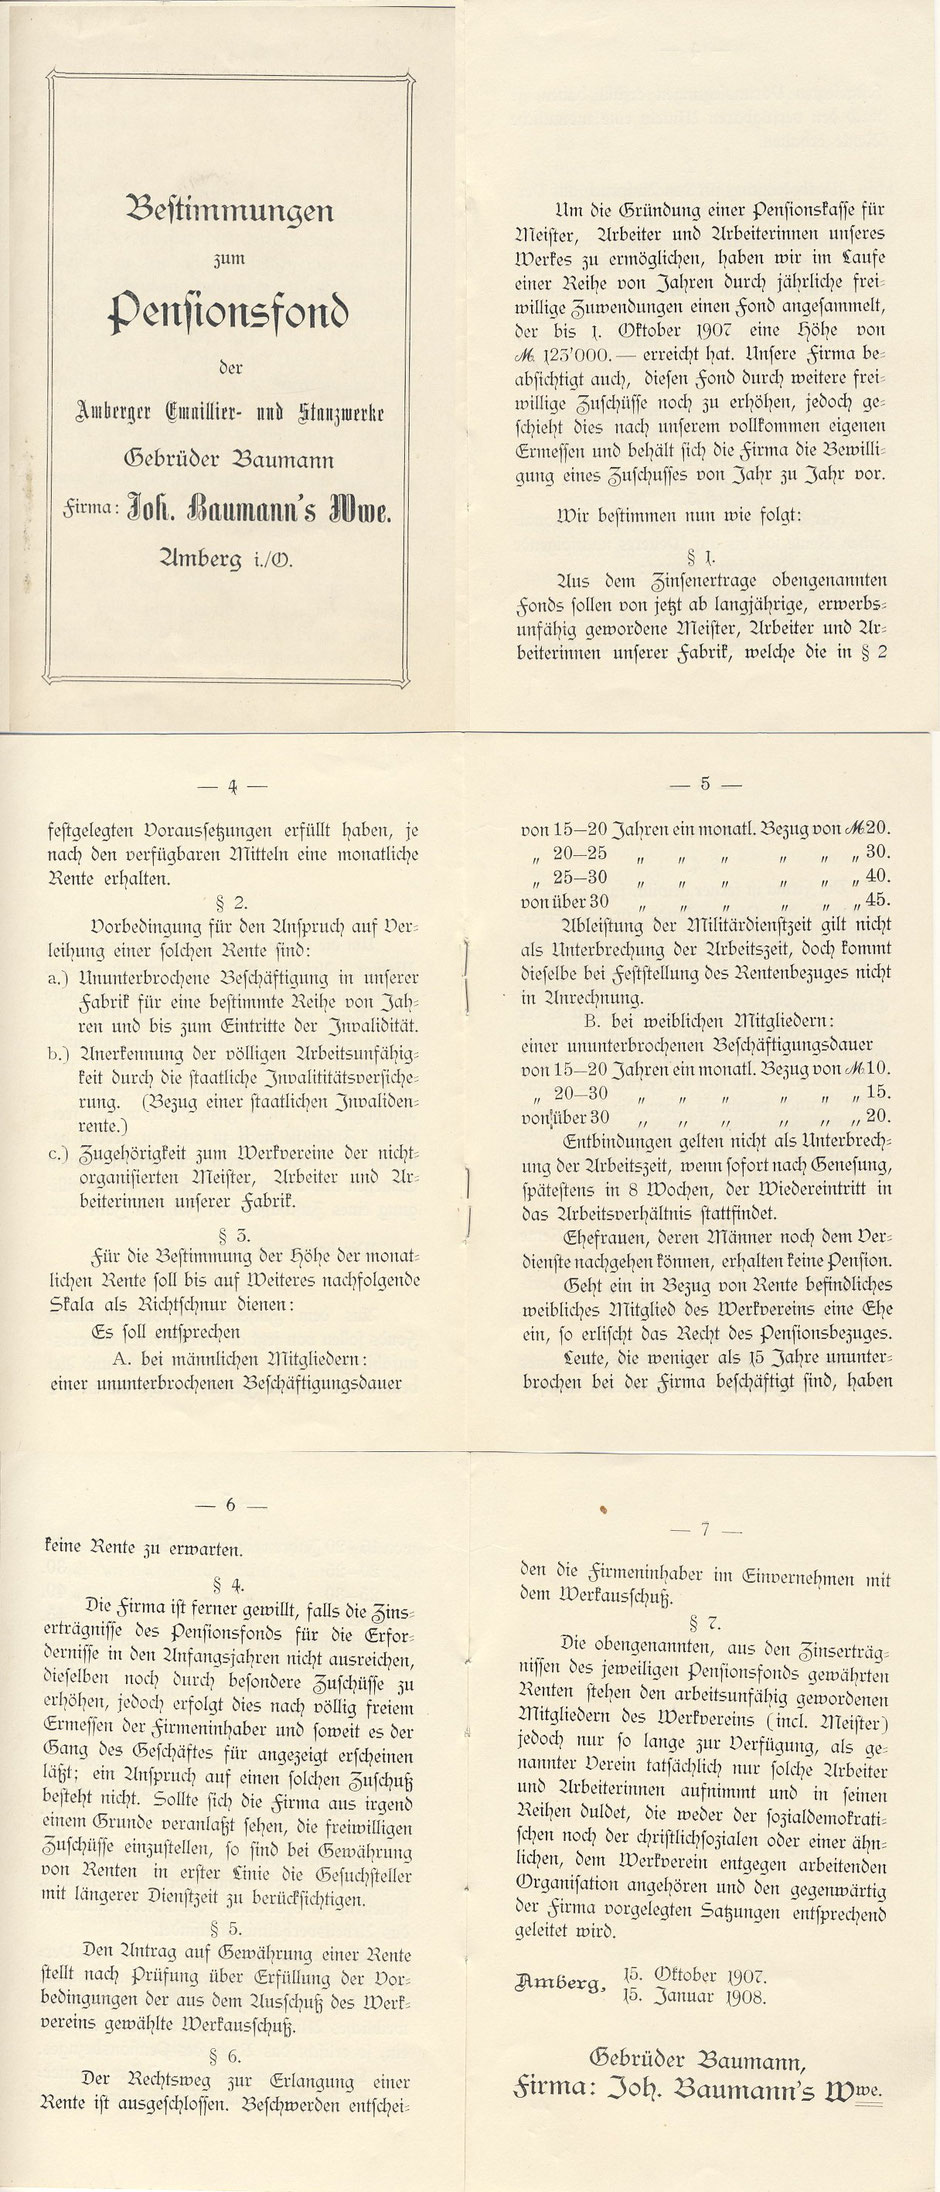 Statuten des Pensionsfonds 1908 [11]